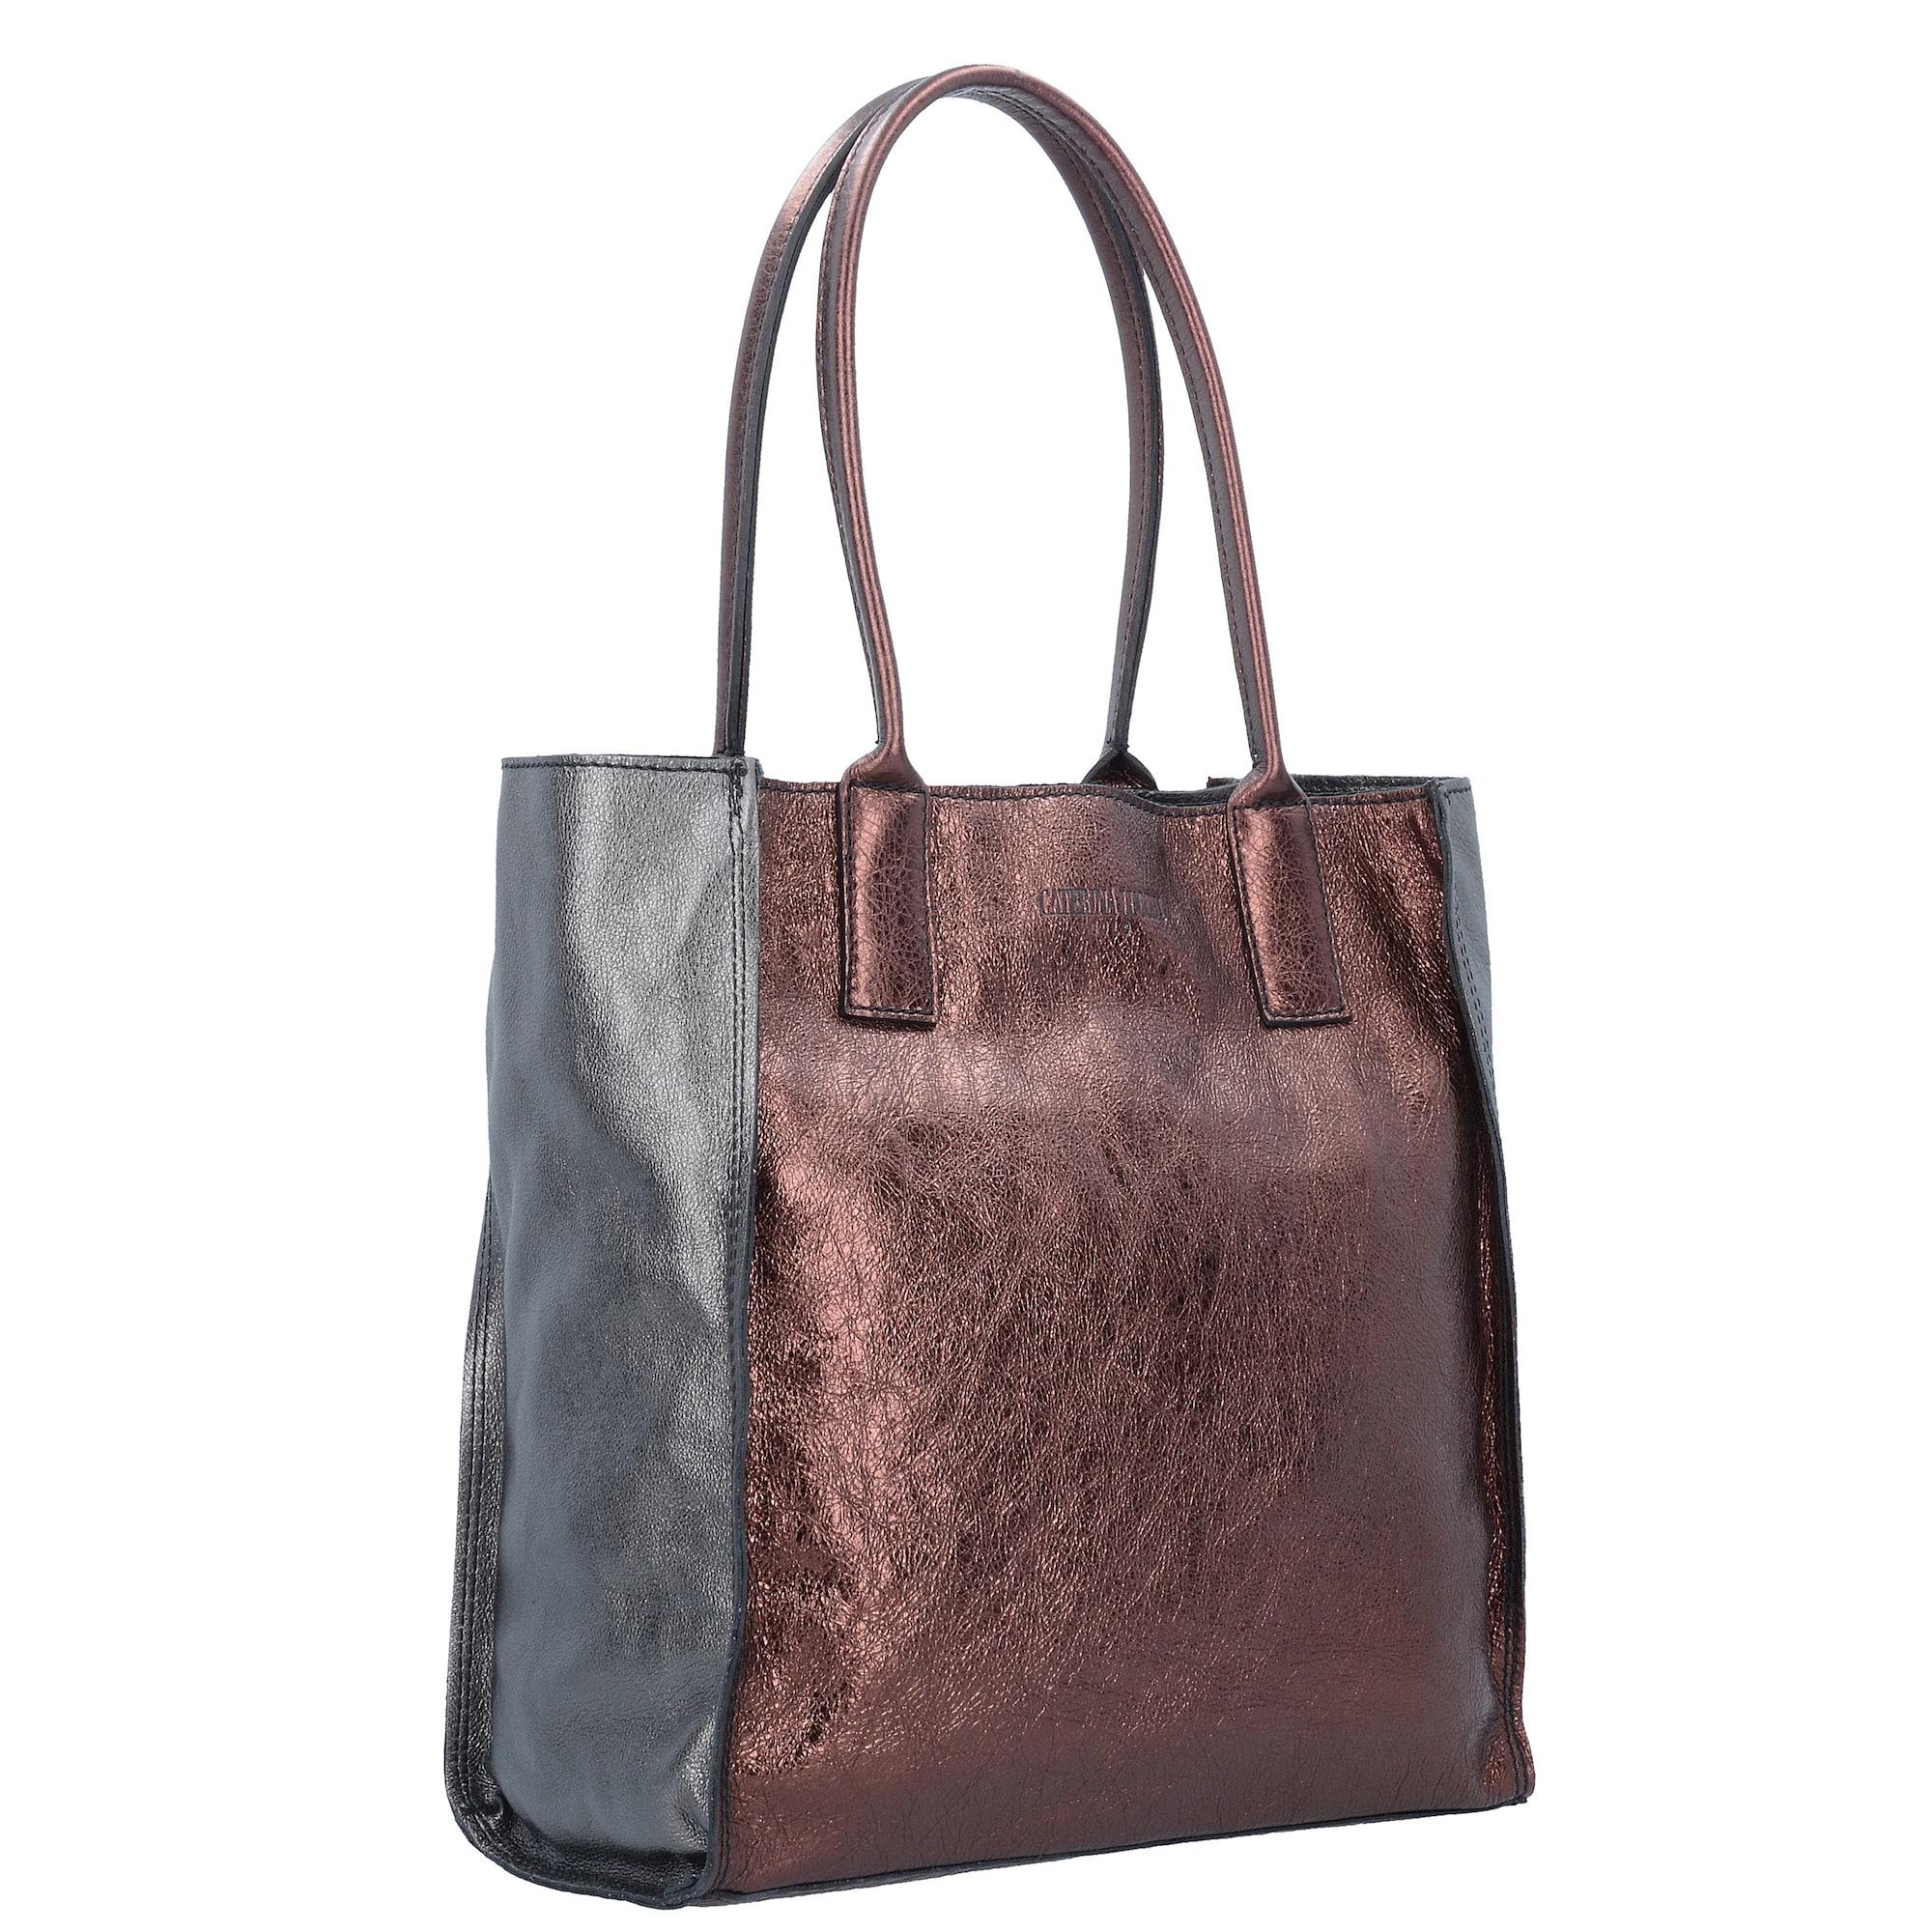 caterina lucchi - Shopper Tasche Leder 29 cm